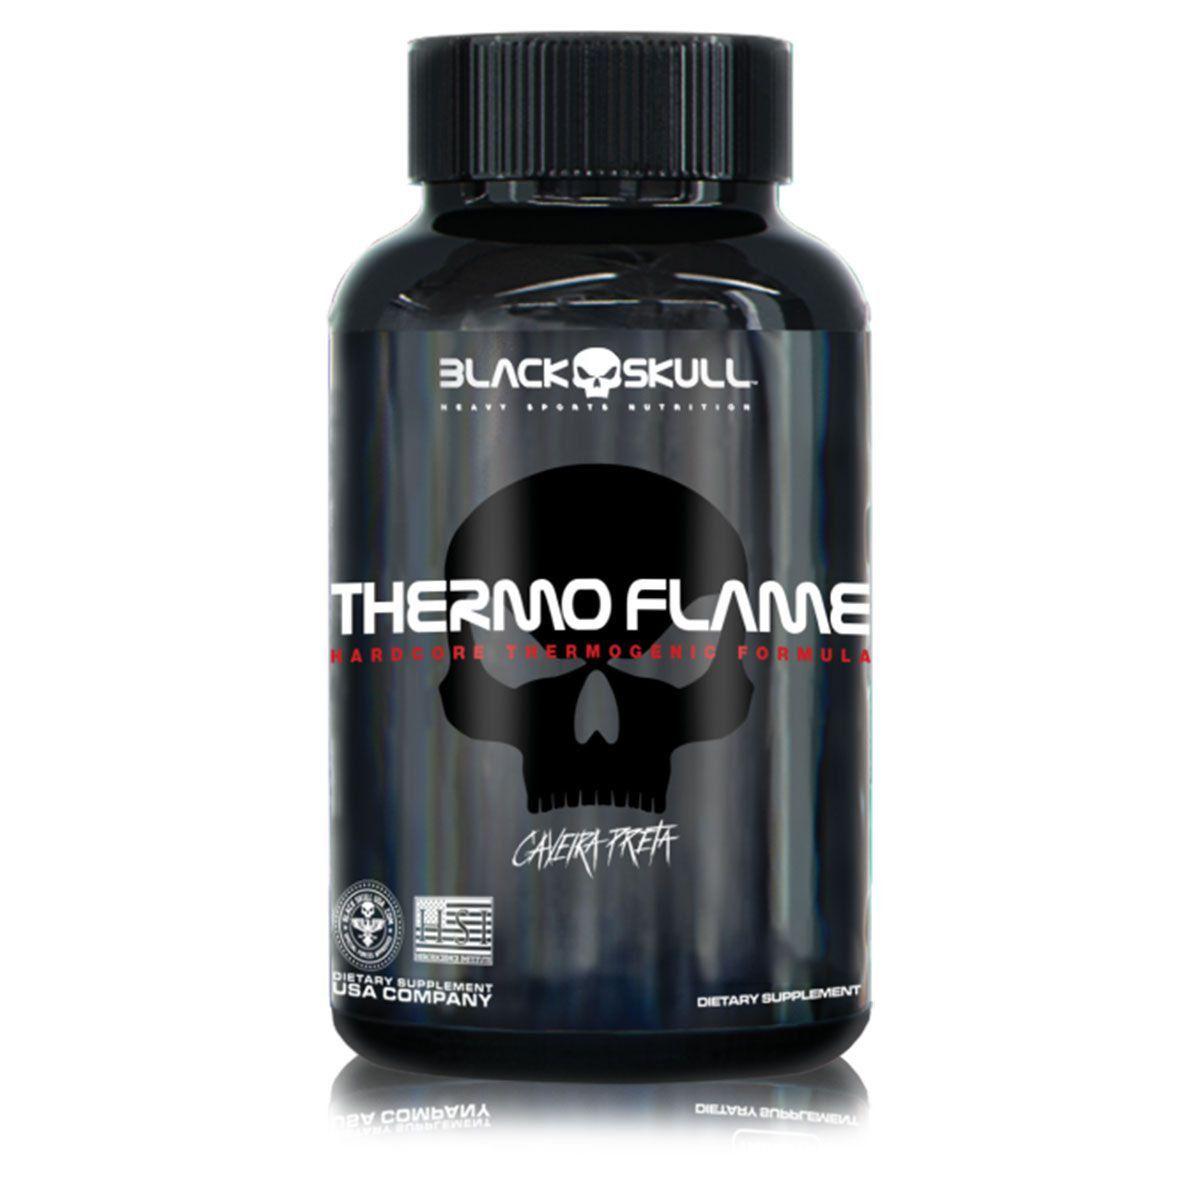 Termogênico Thermo Flame 60 Tabletes - Black Skull